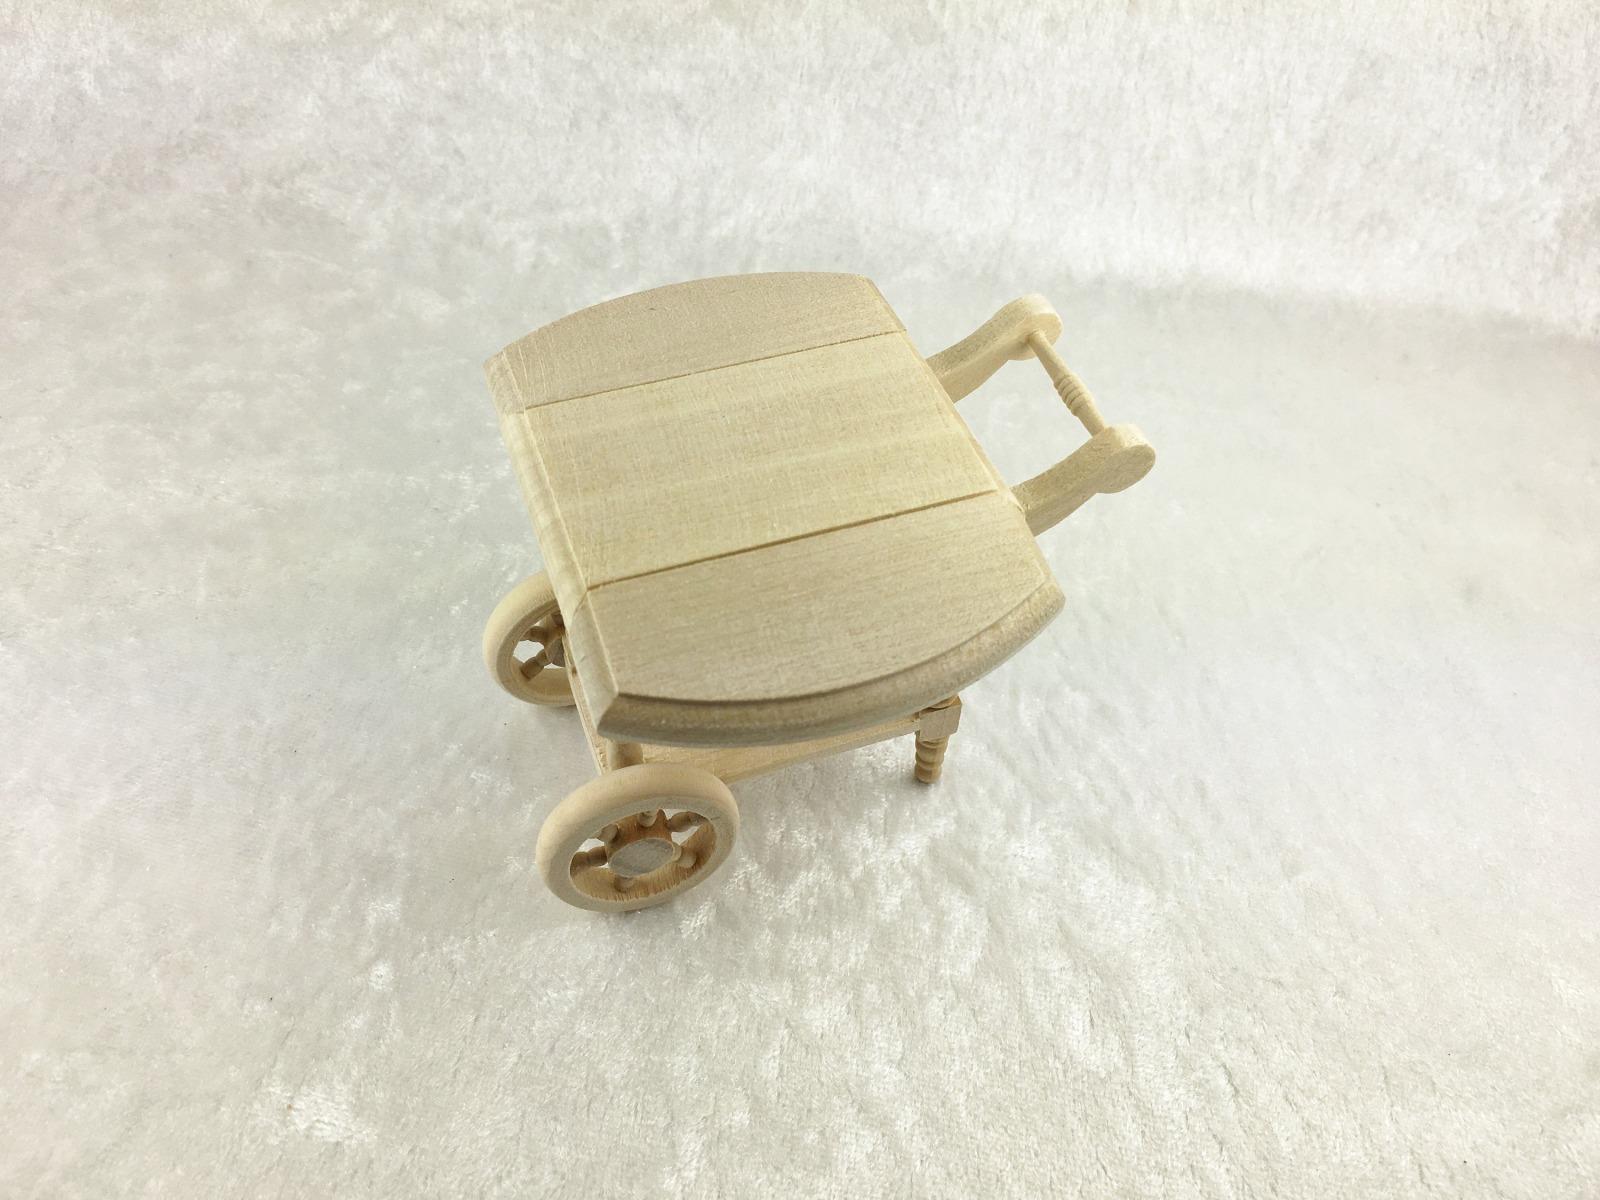 Teewagen 1:12 Miniatur 2